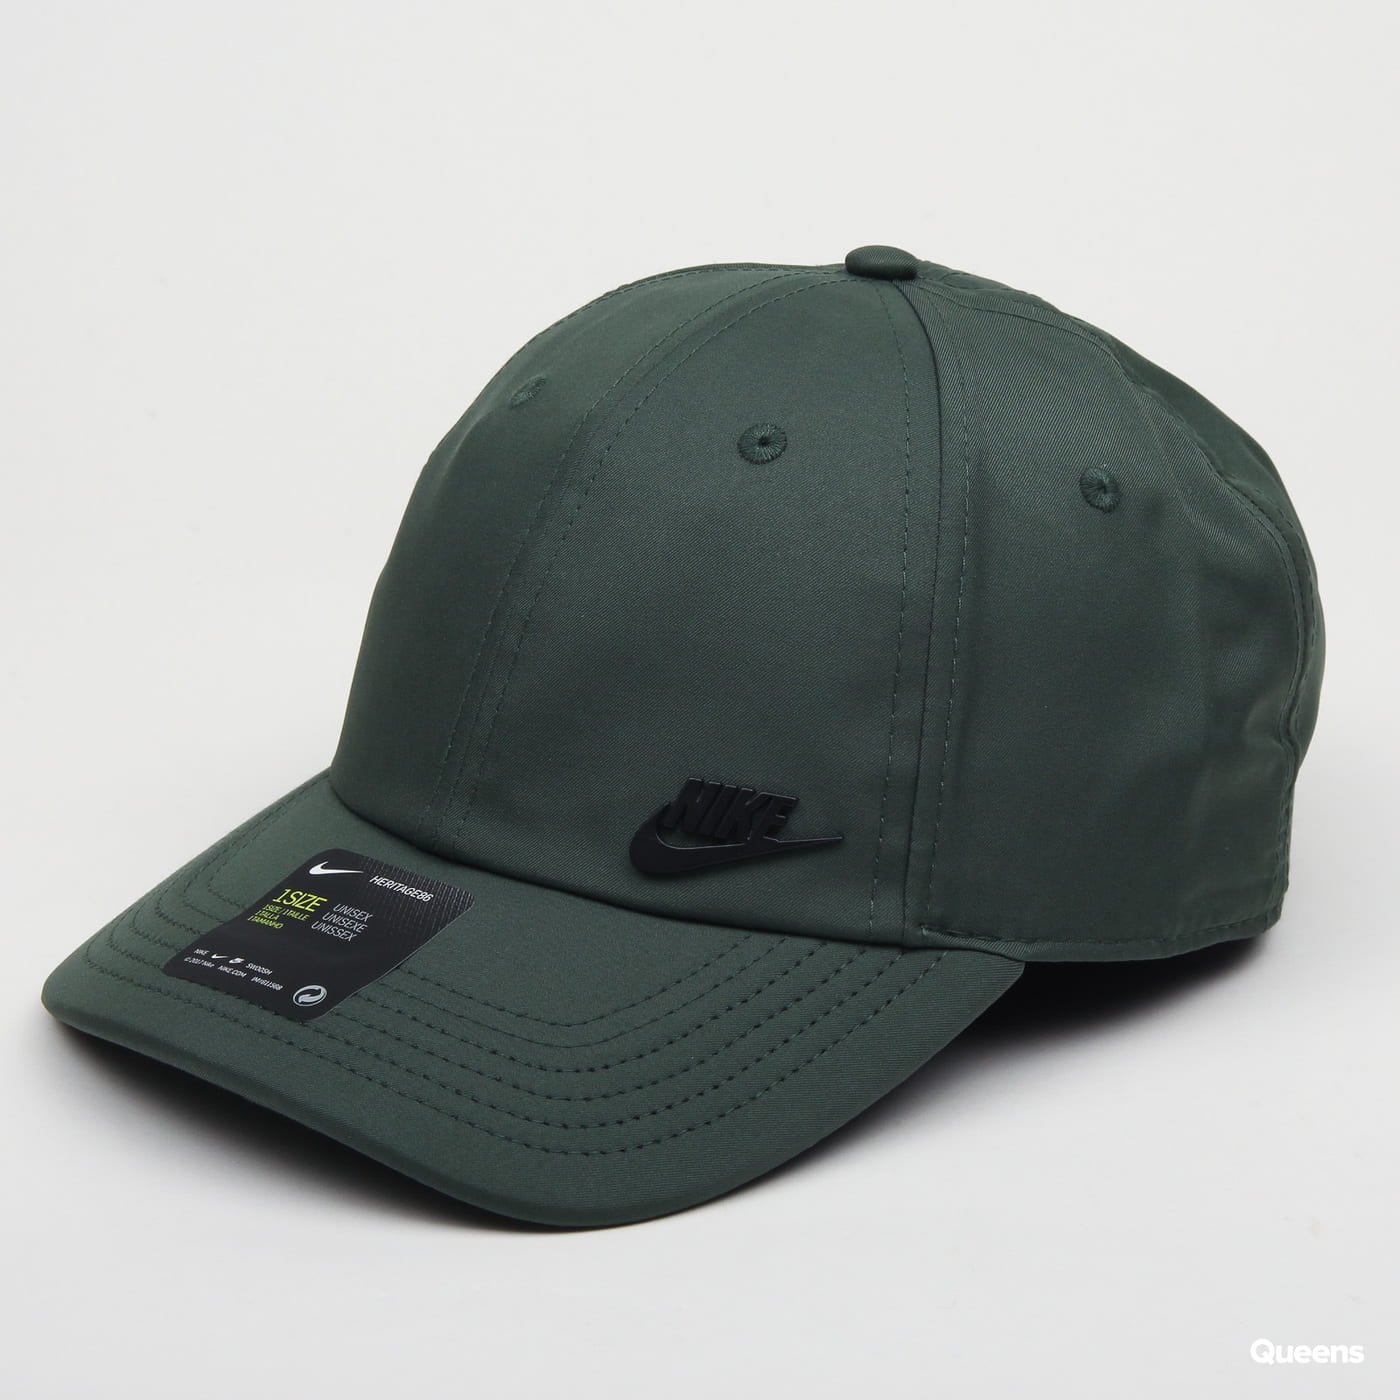 1acd5b19b Šiltovka Nike U NSW Arobill H86 Cap tmavozelená (942212-370) – Queens 💚